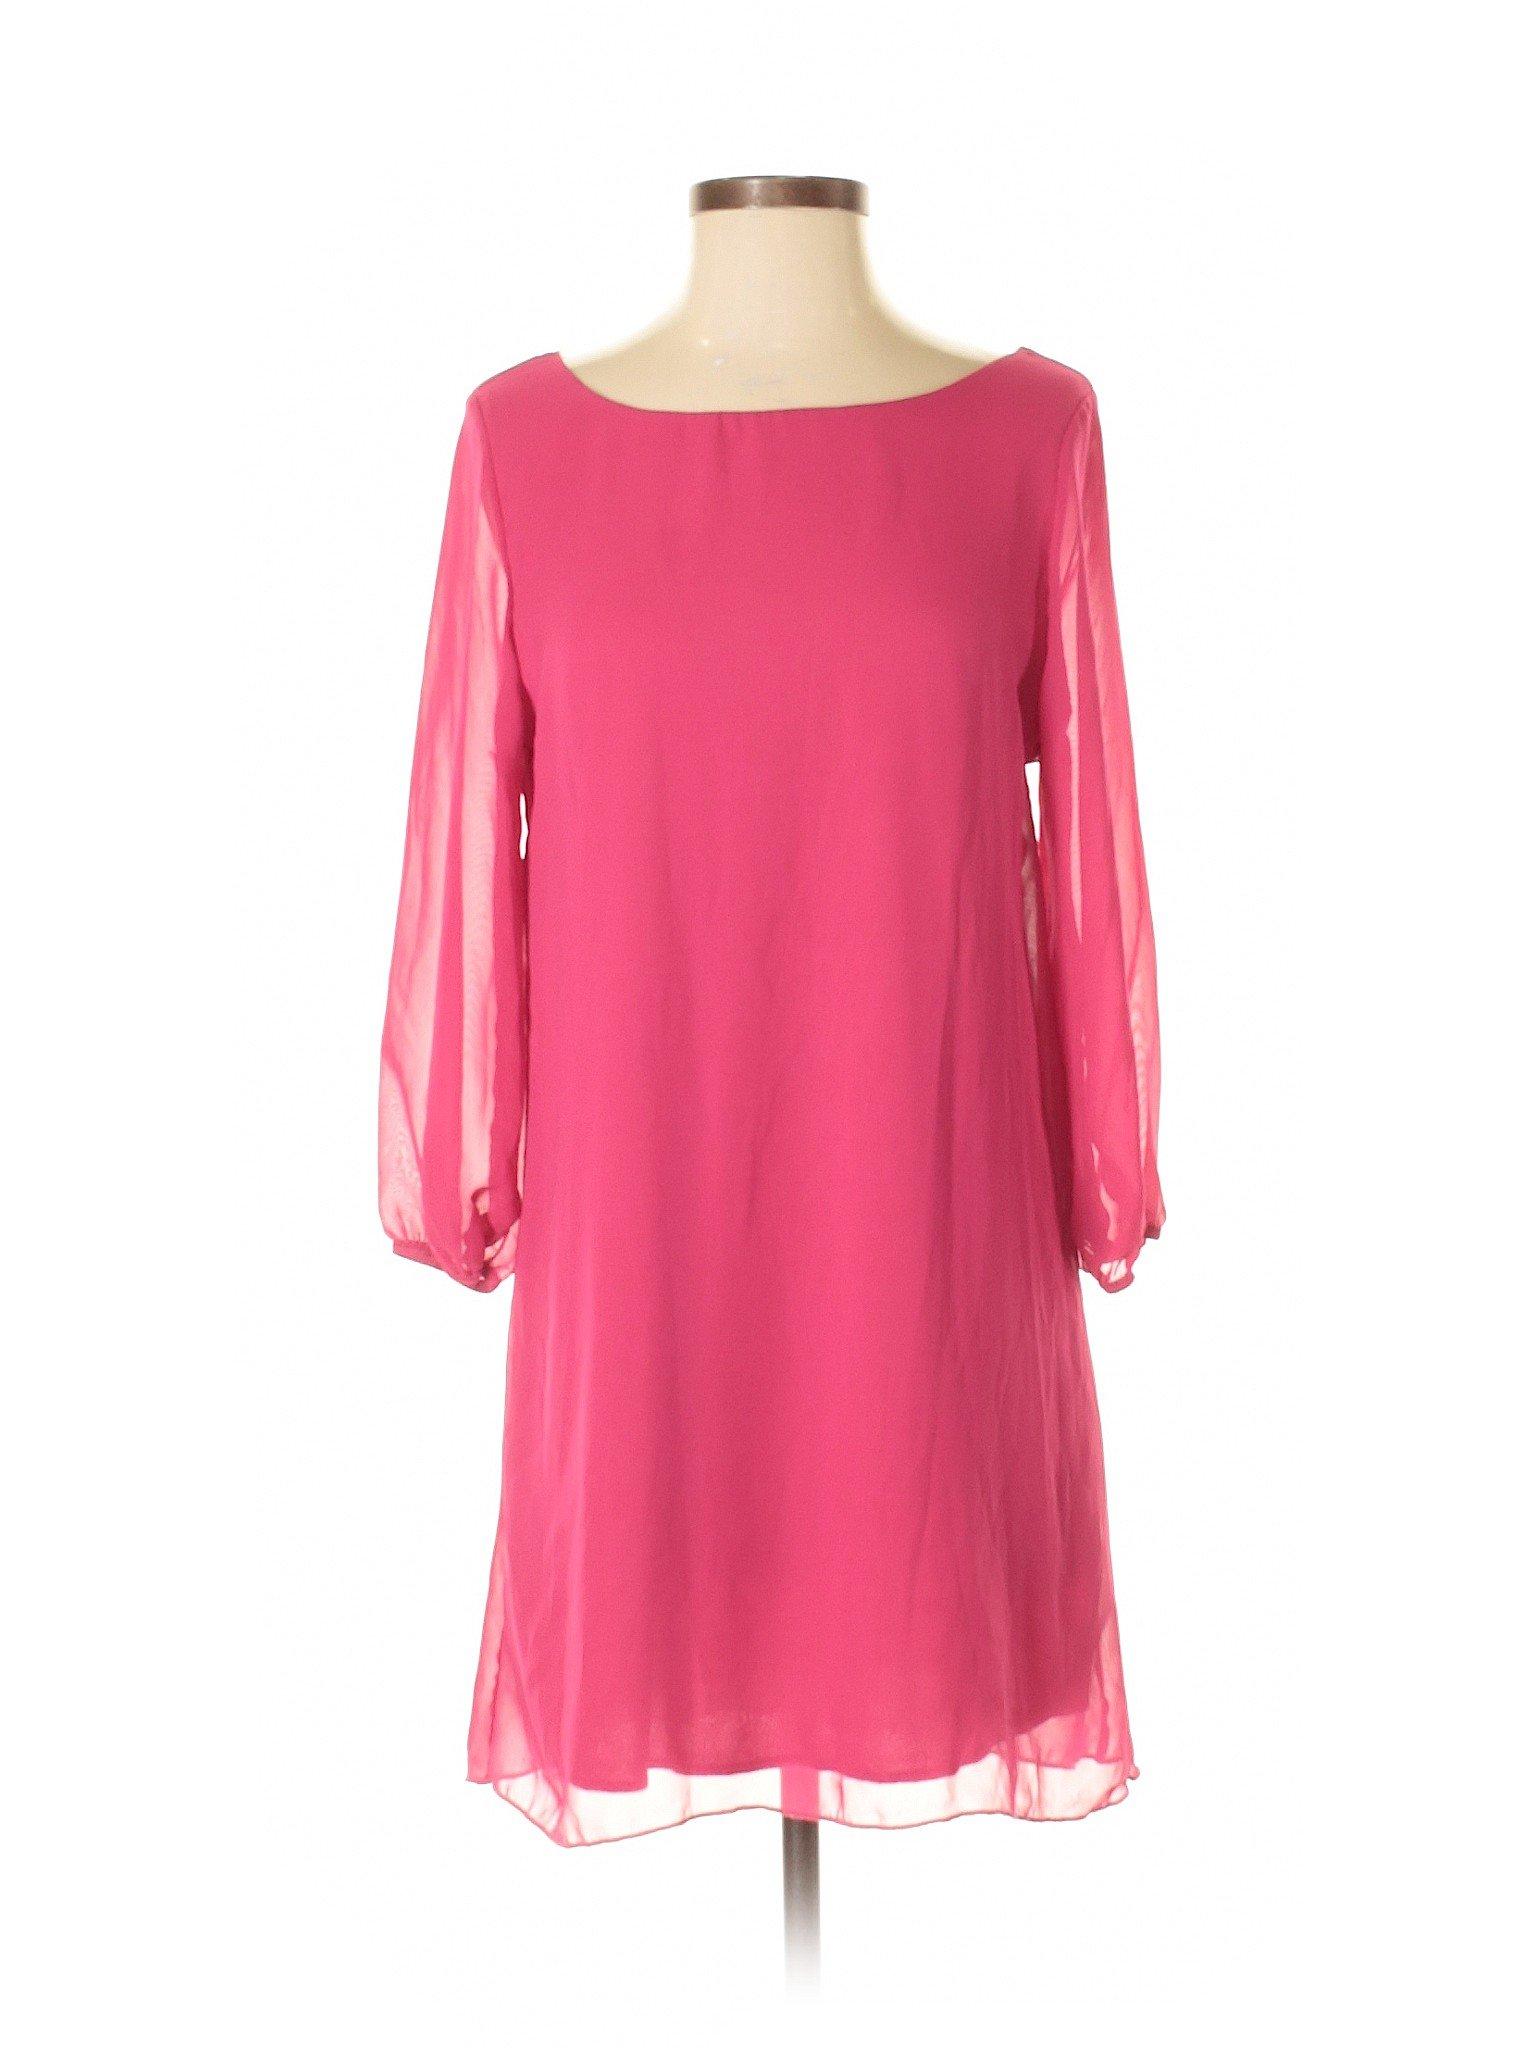 in Mi Dress in Selling Dress Mi Casual Selling Casual wSq77aY